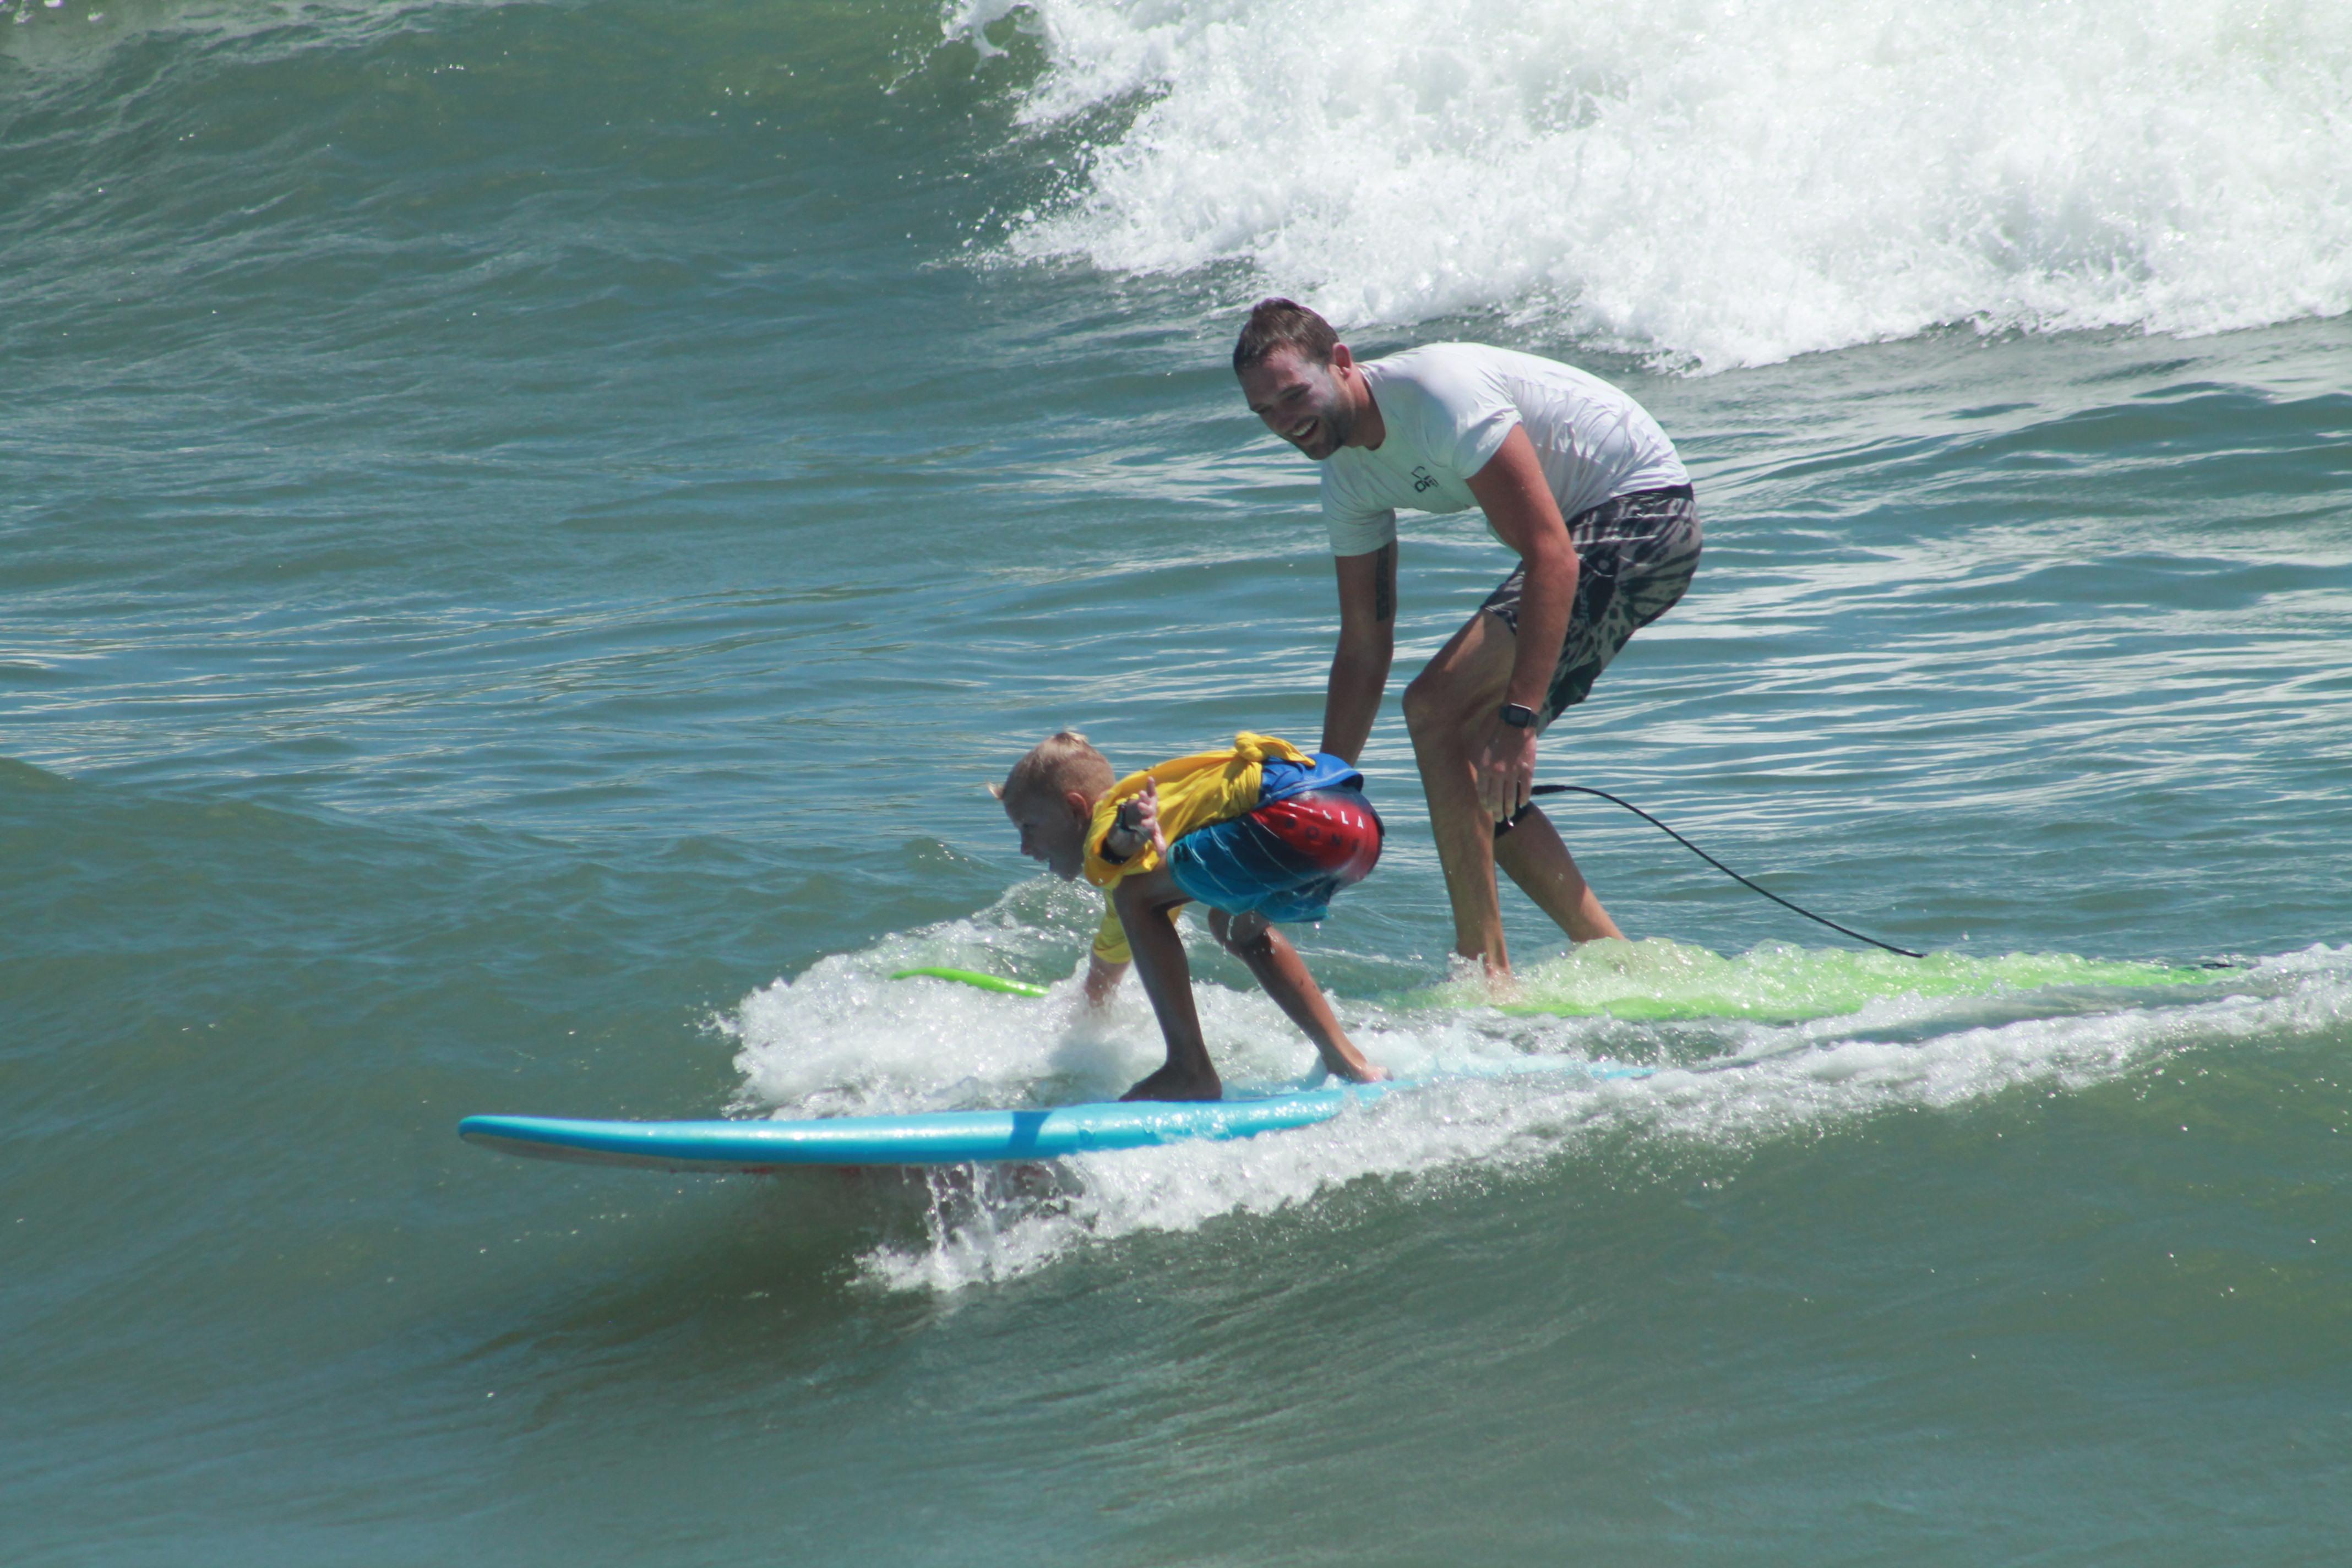 SC surfers take top spots at pro am surf fest - Lumina News